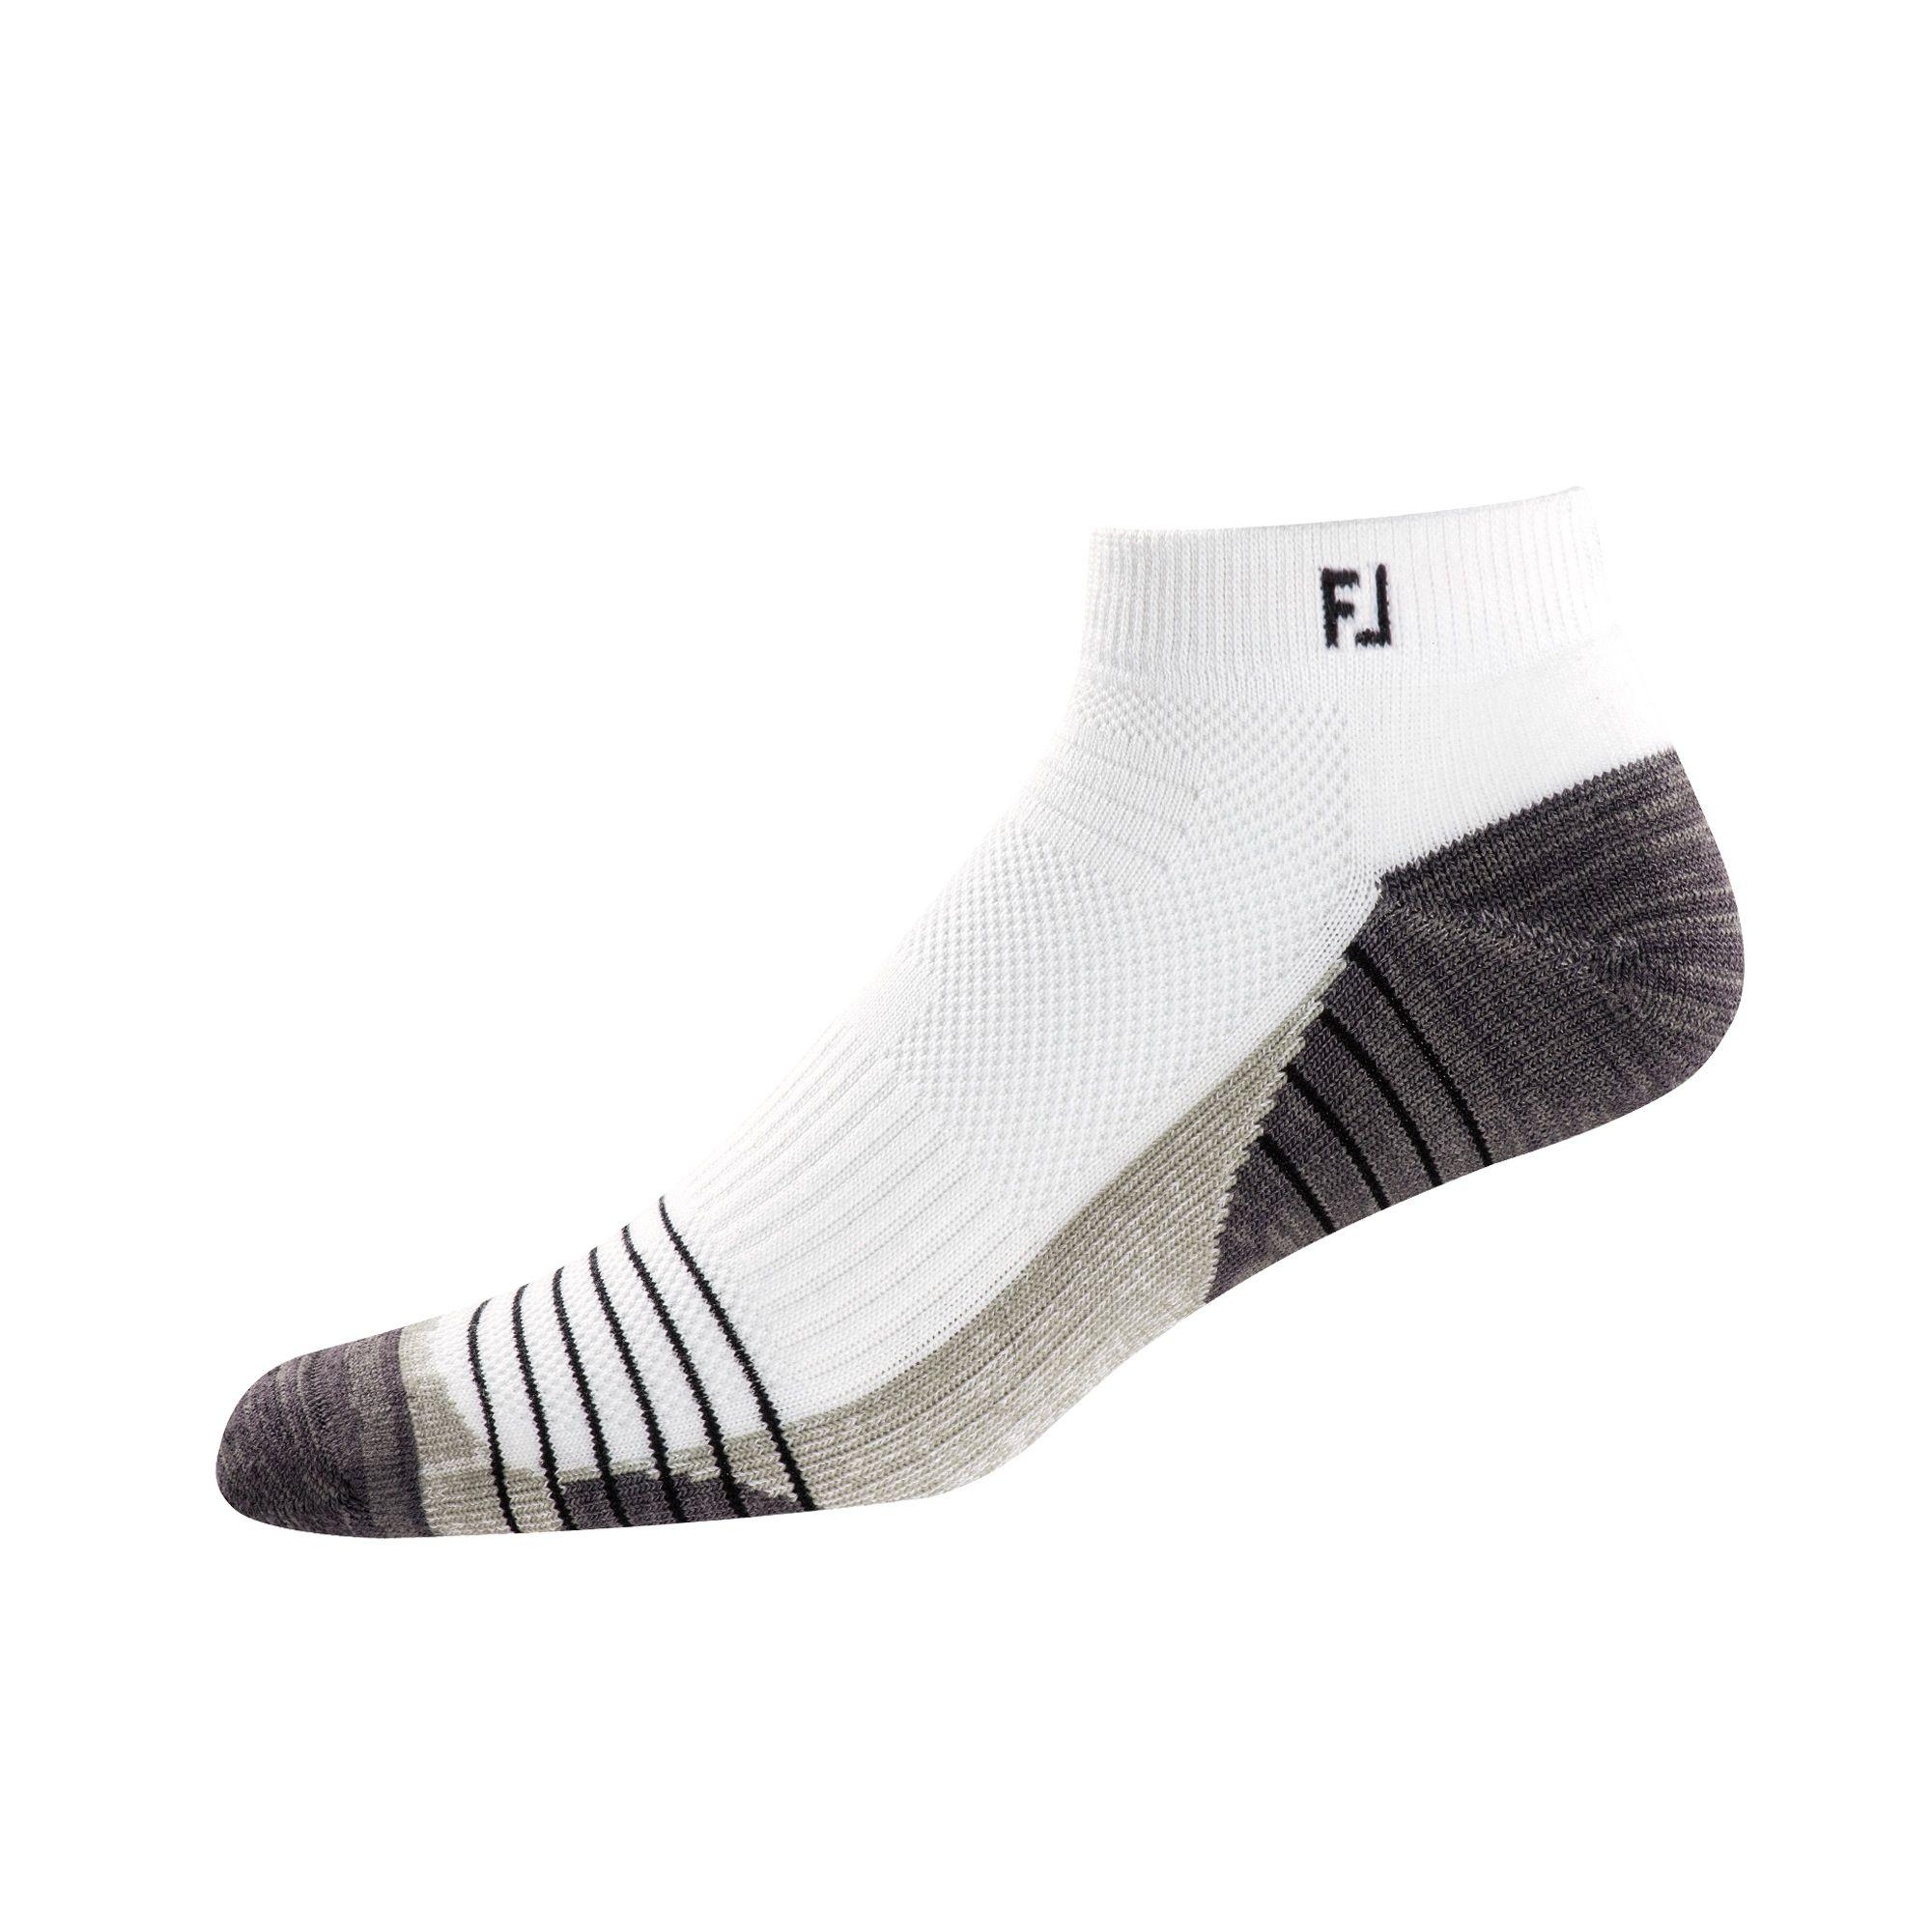 Footjoy striped socks